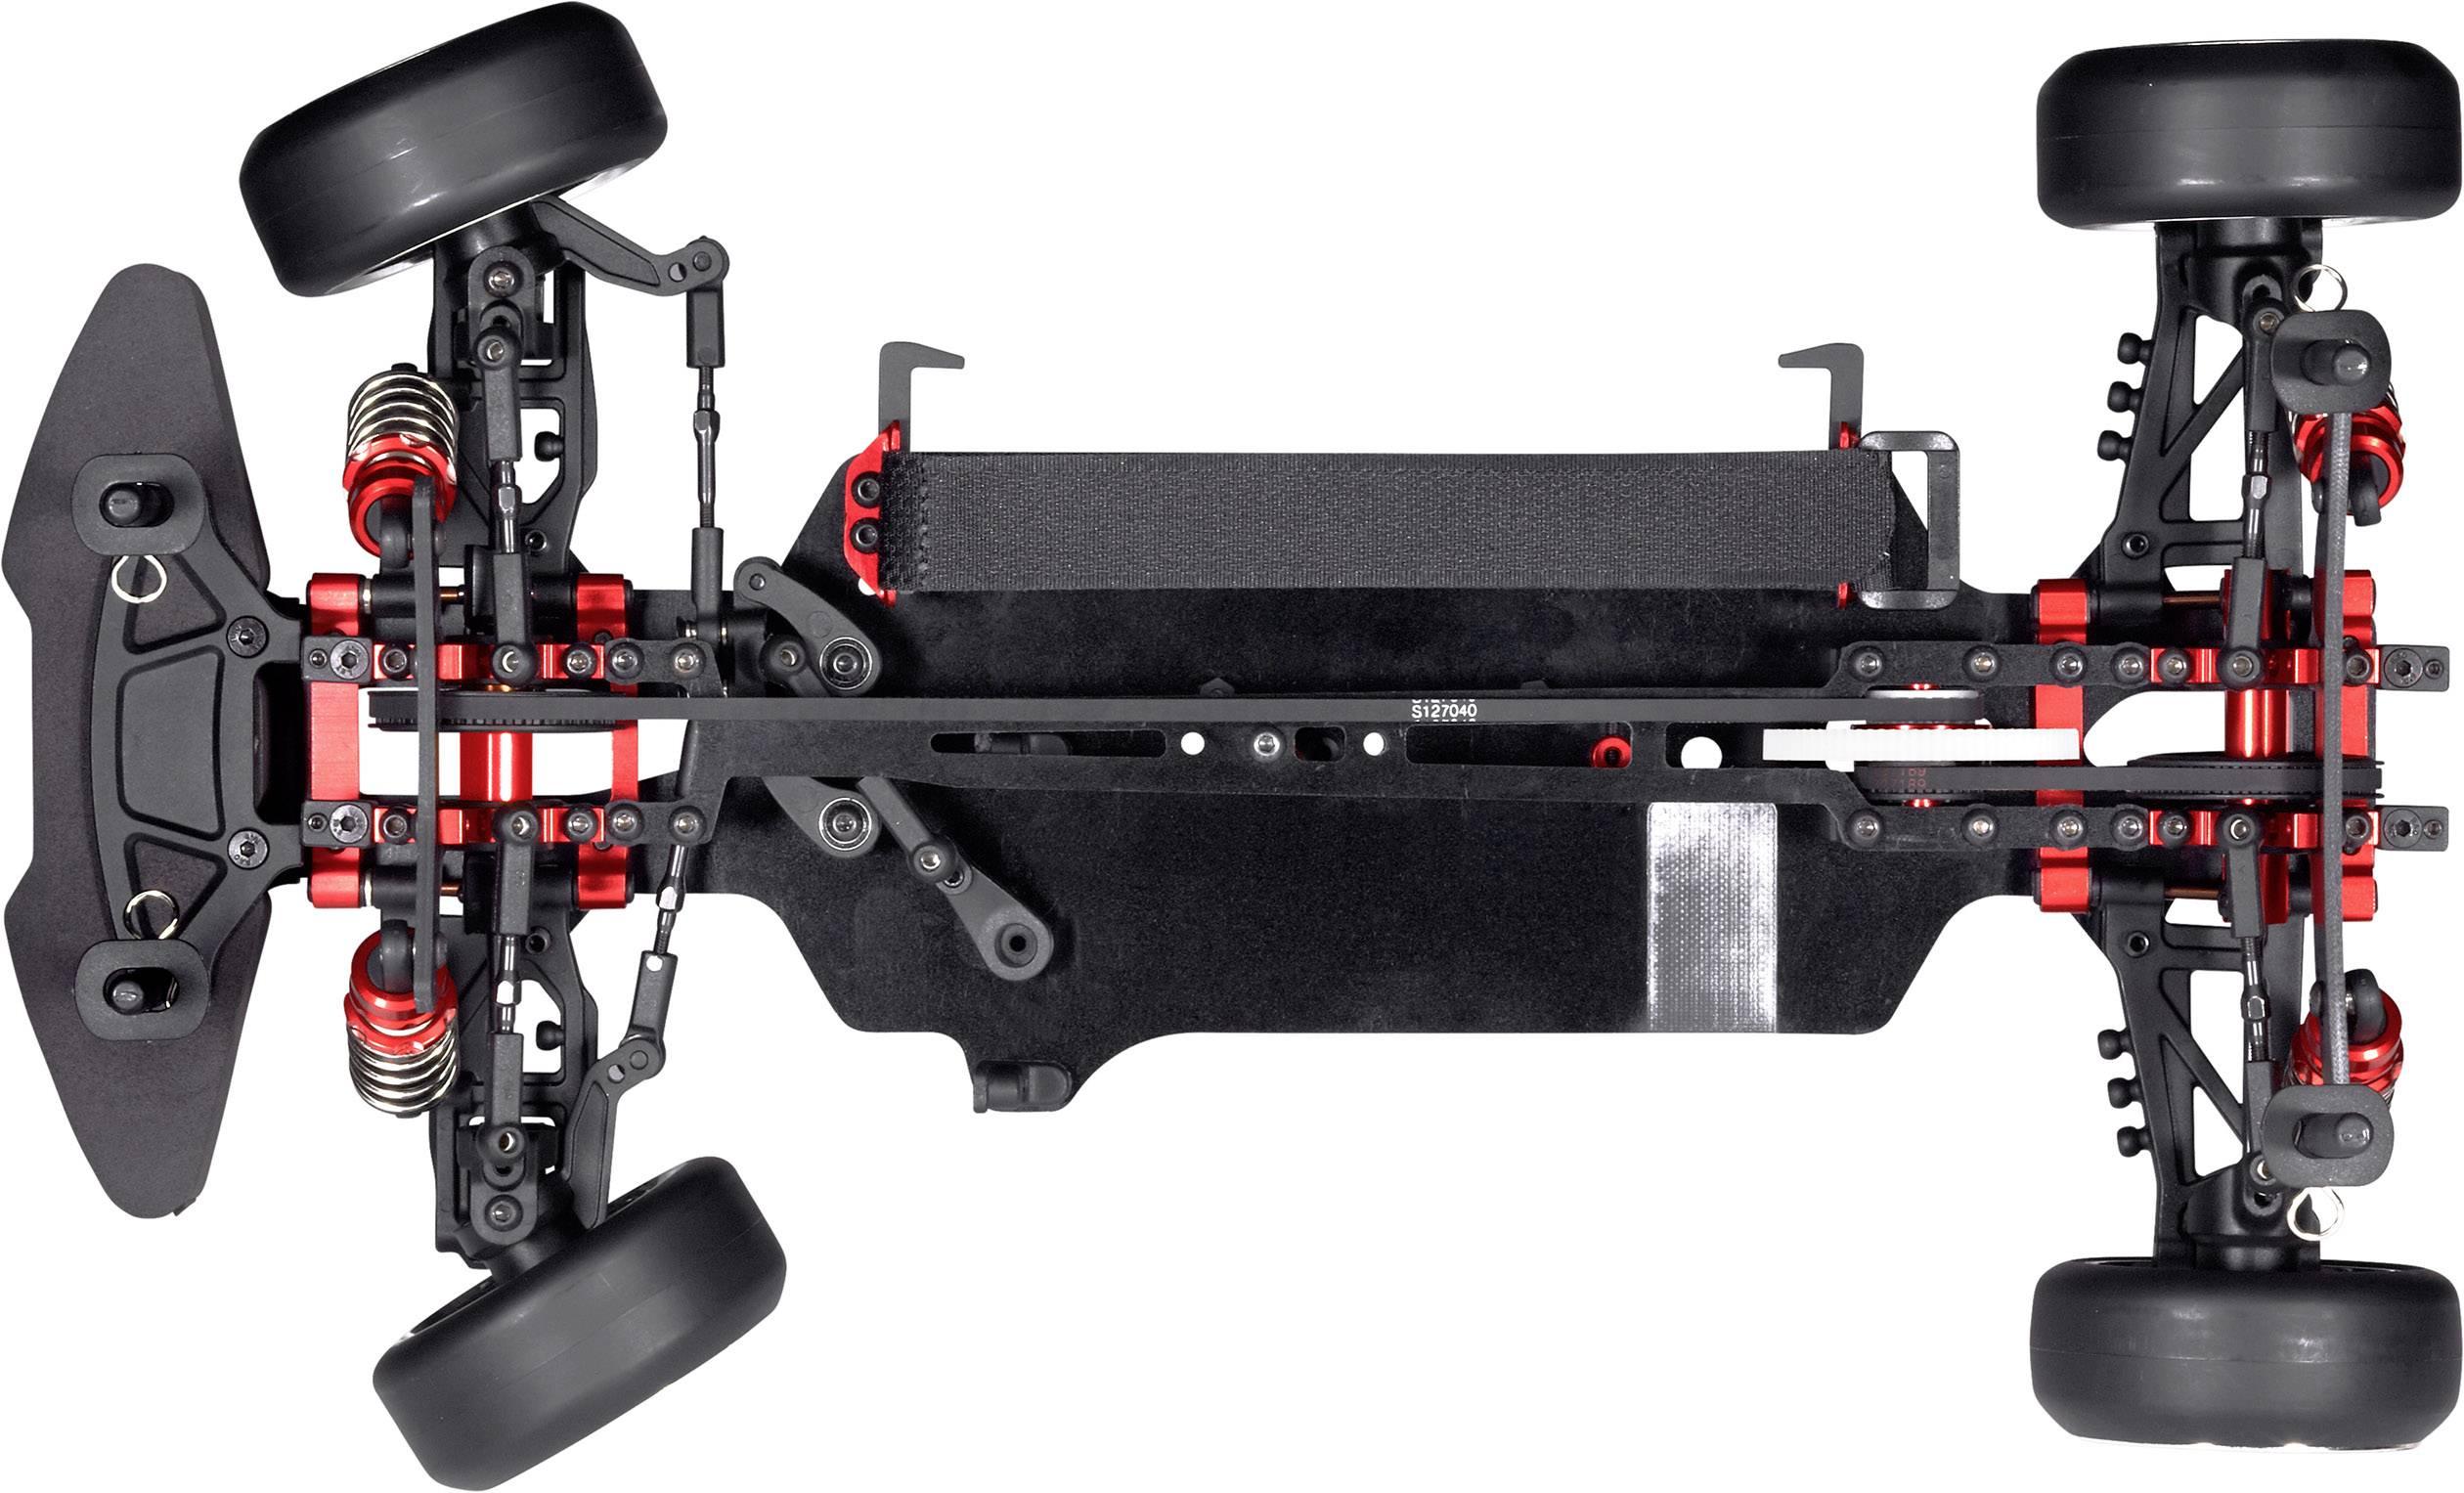 Šasi pre RC model auta Reely Drift-Chassis RD-01, 1:10, elektrický, 4WD (4x4), ARR